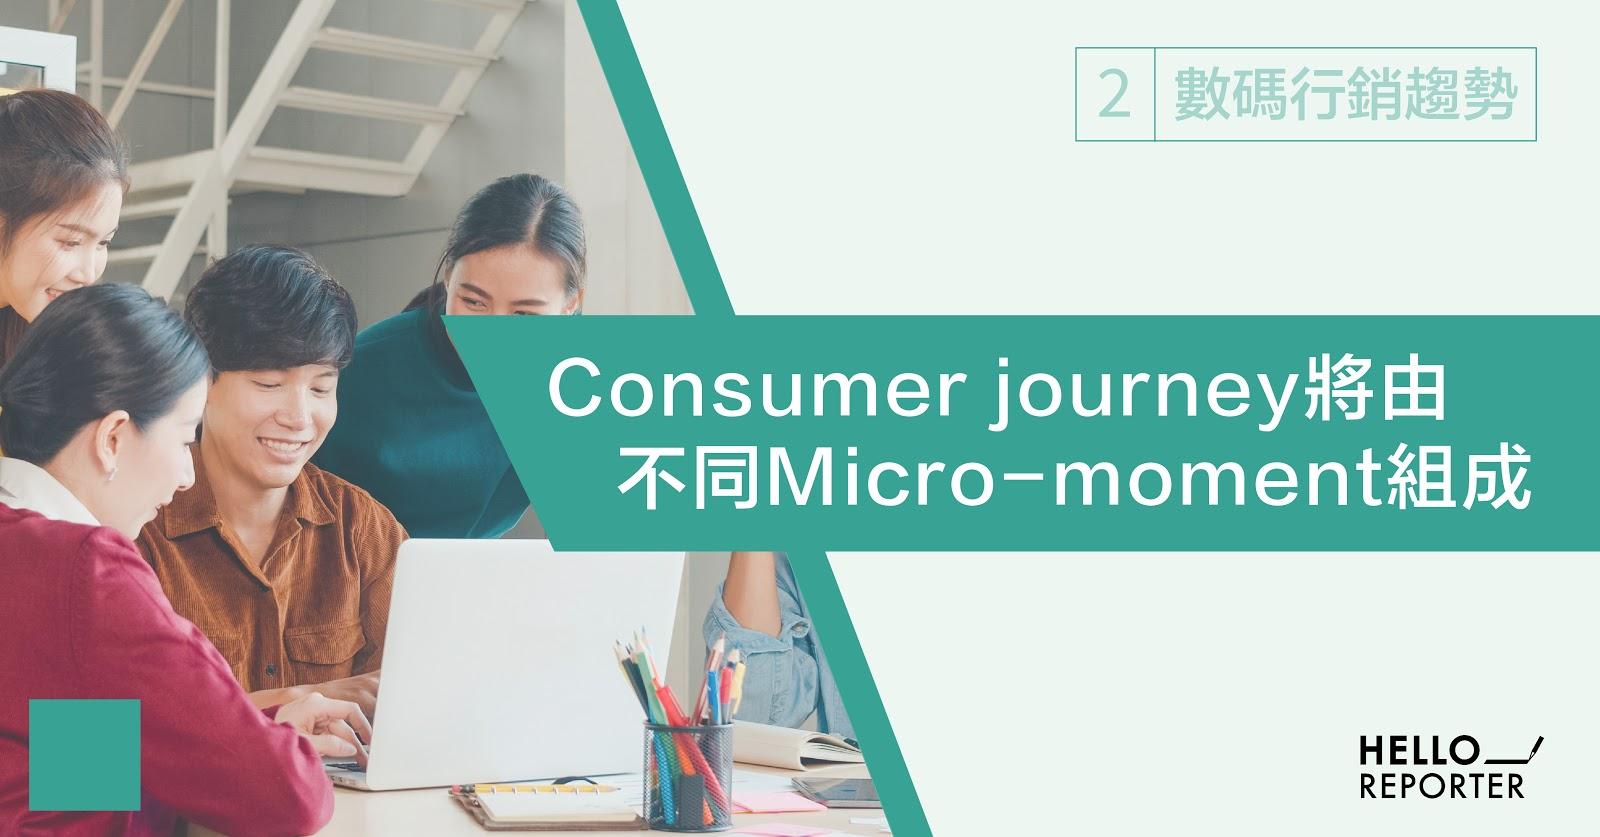 數碼行銷趨勢2:新的Consumer journey將由不同Micro-moment組成